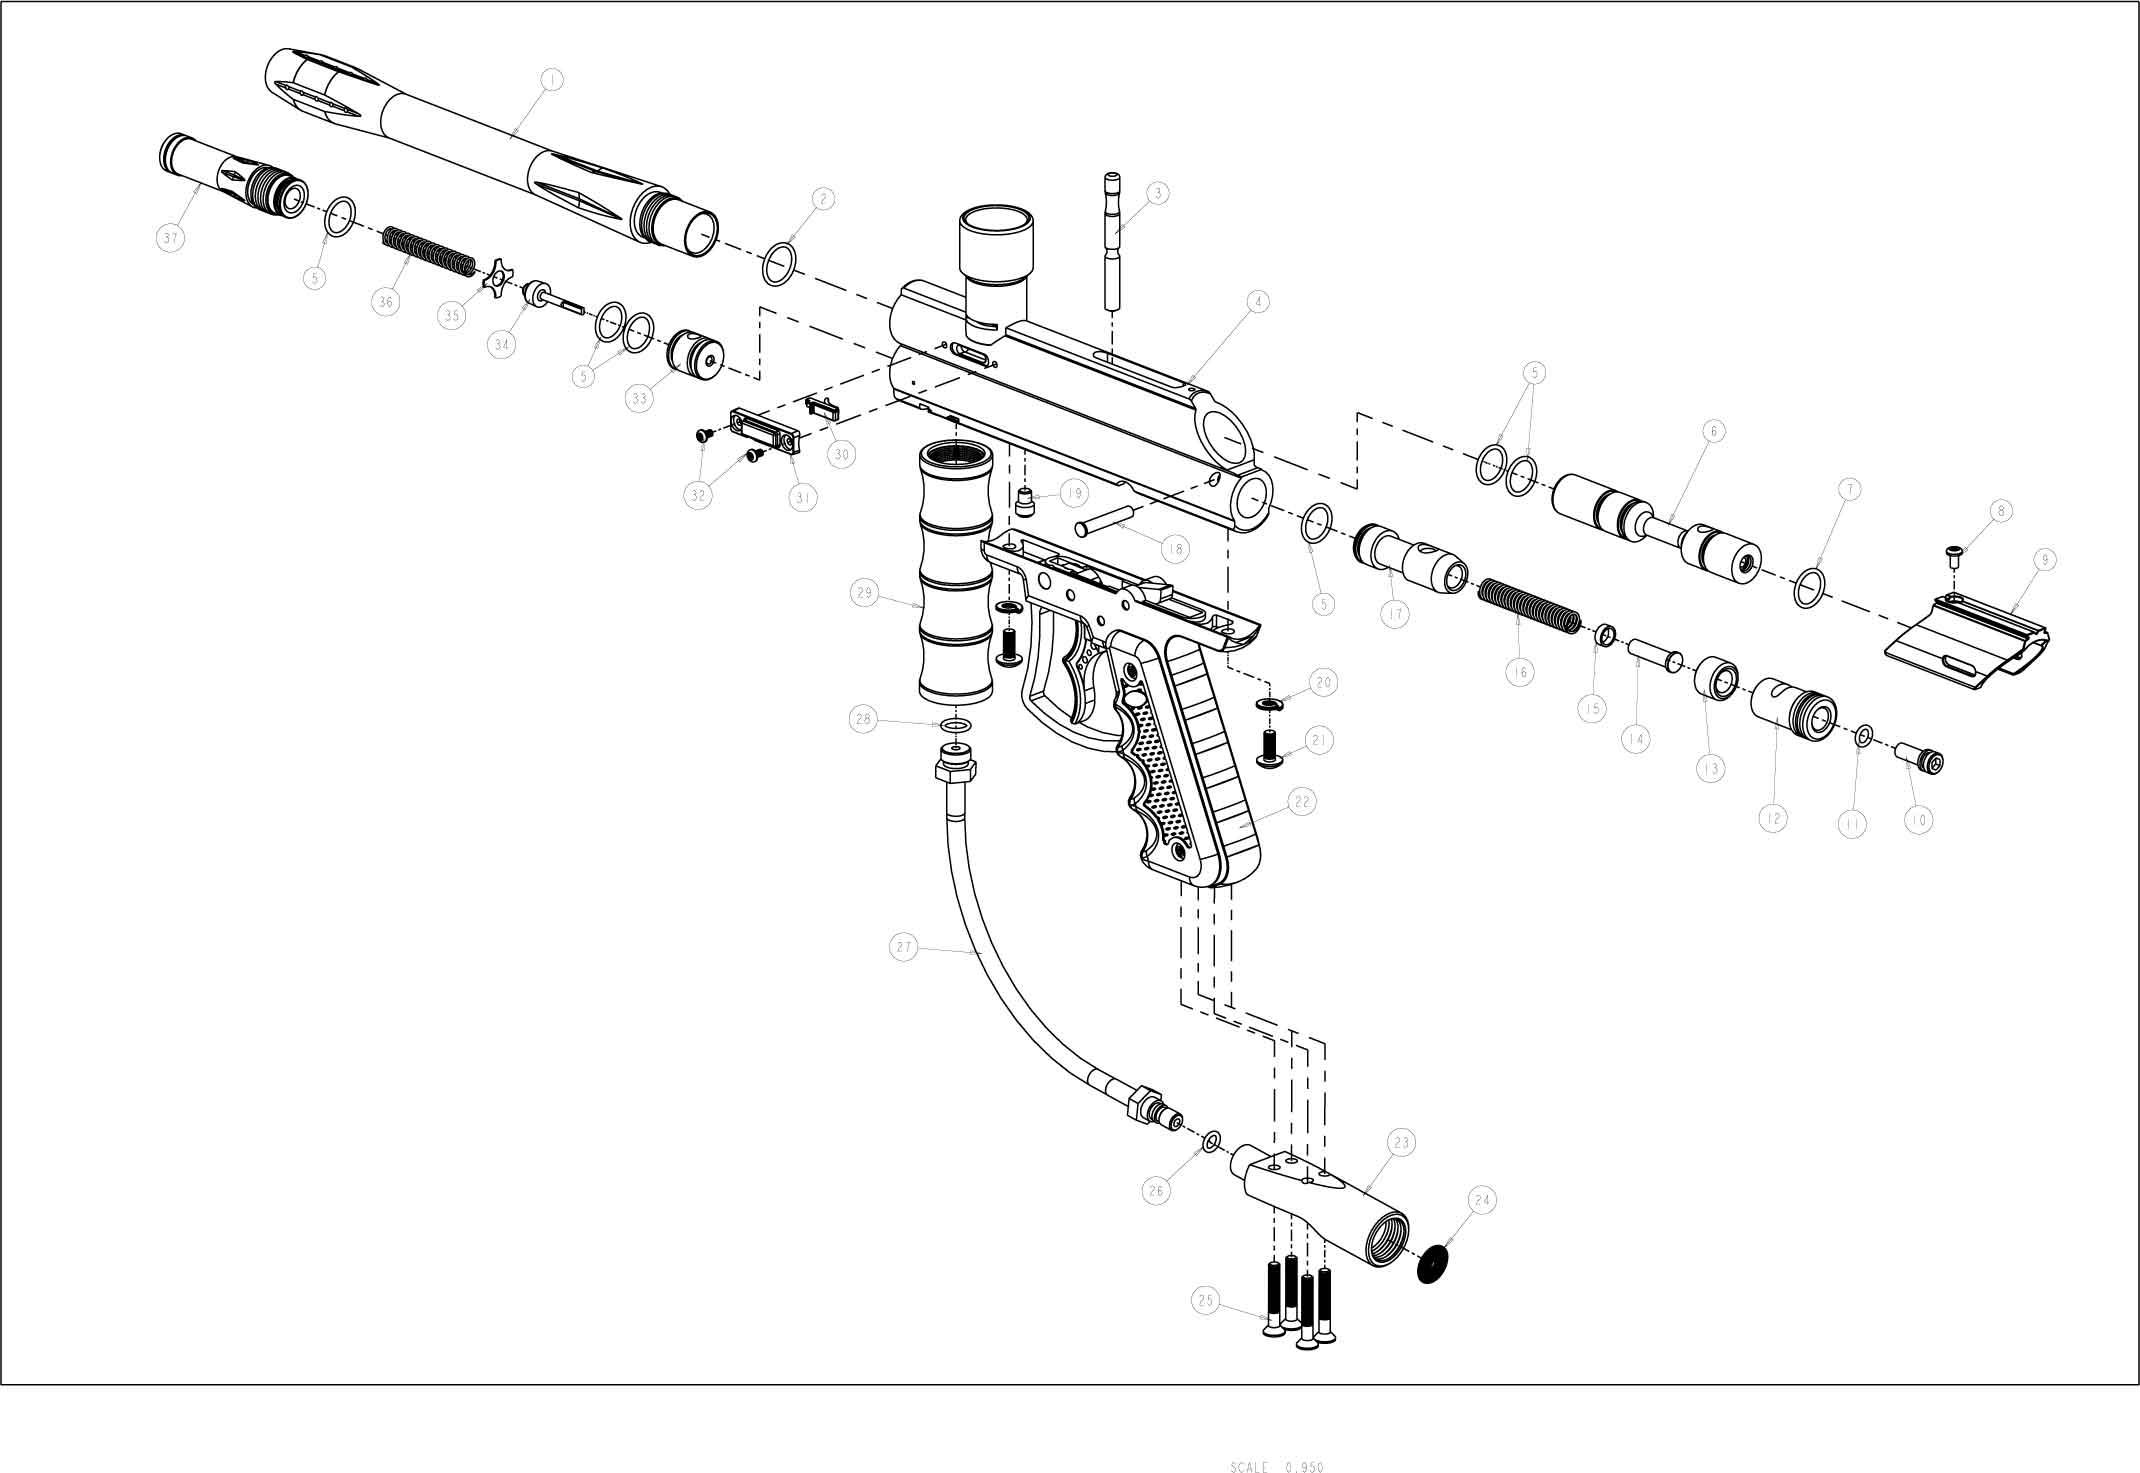 Viewloader Prodigy E Grip Gun Diagram